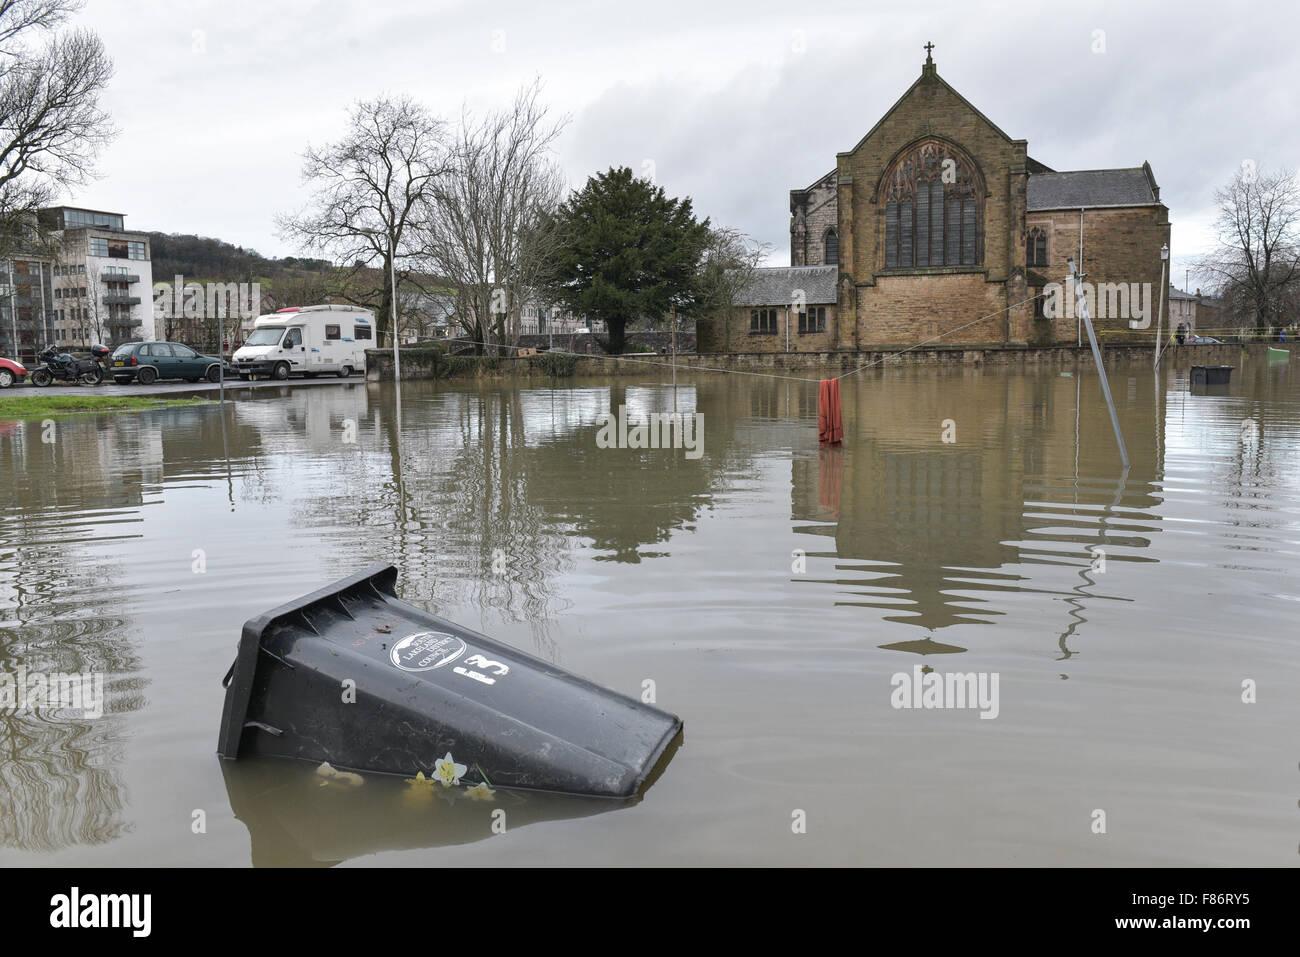 cumbria flood bride battles - HD1300×958